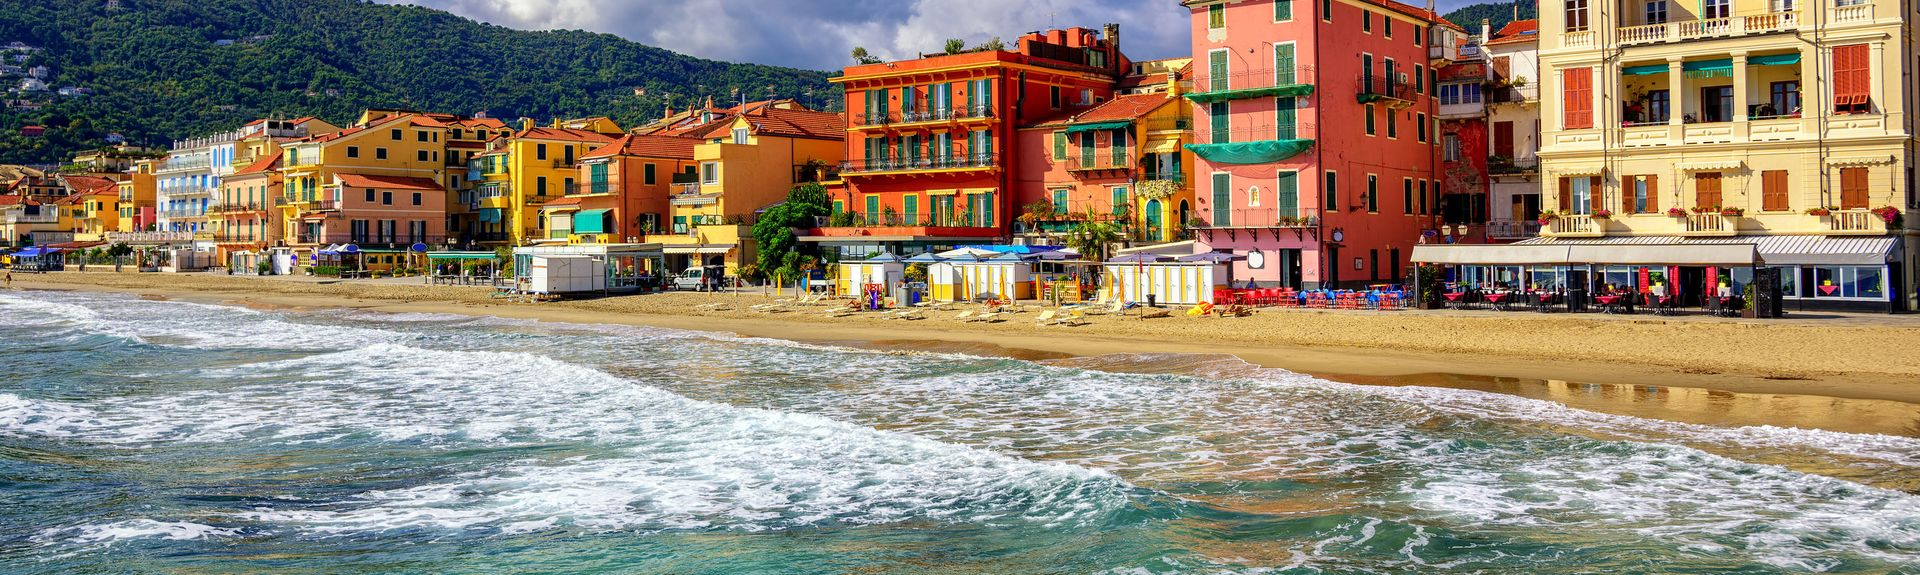 Alassio, Savona, Liguria, Italy